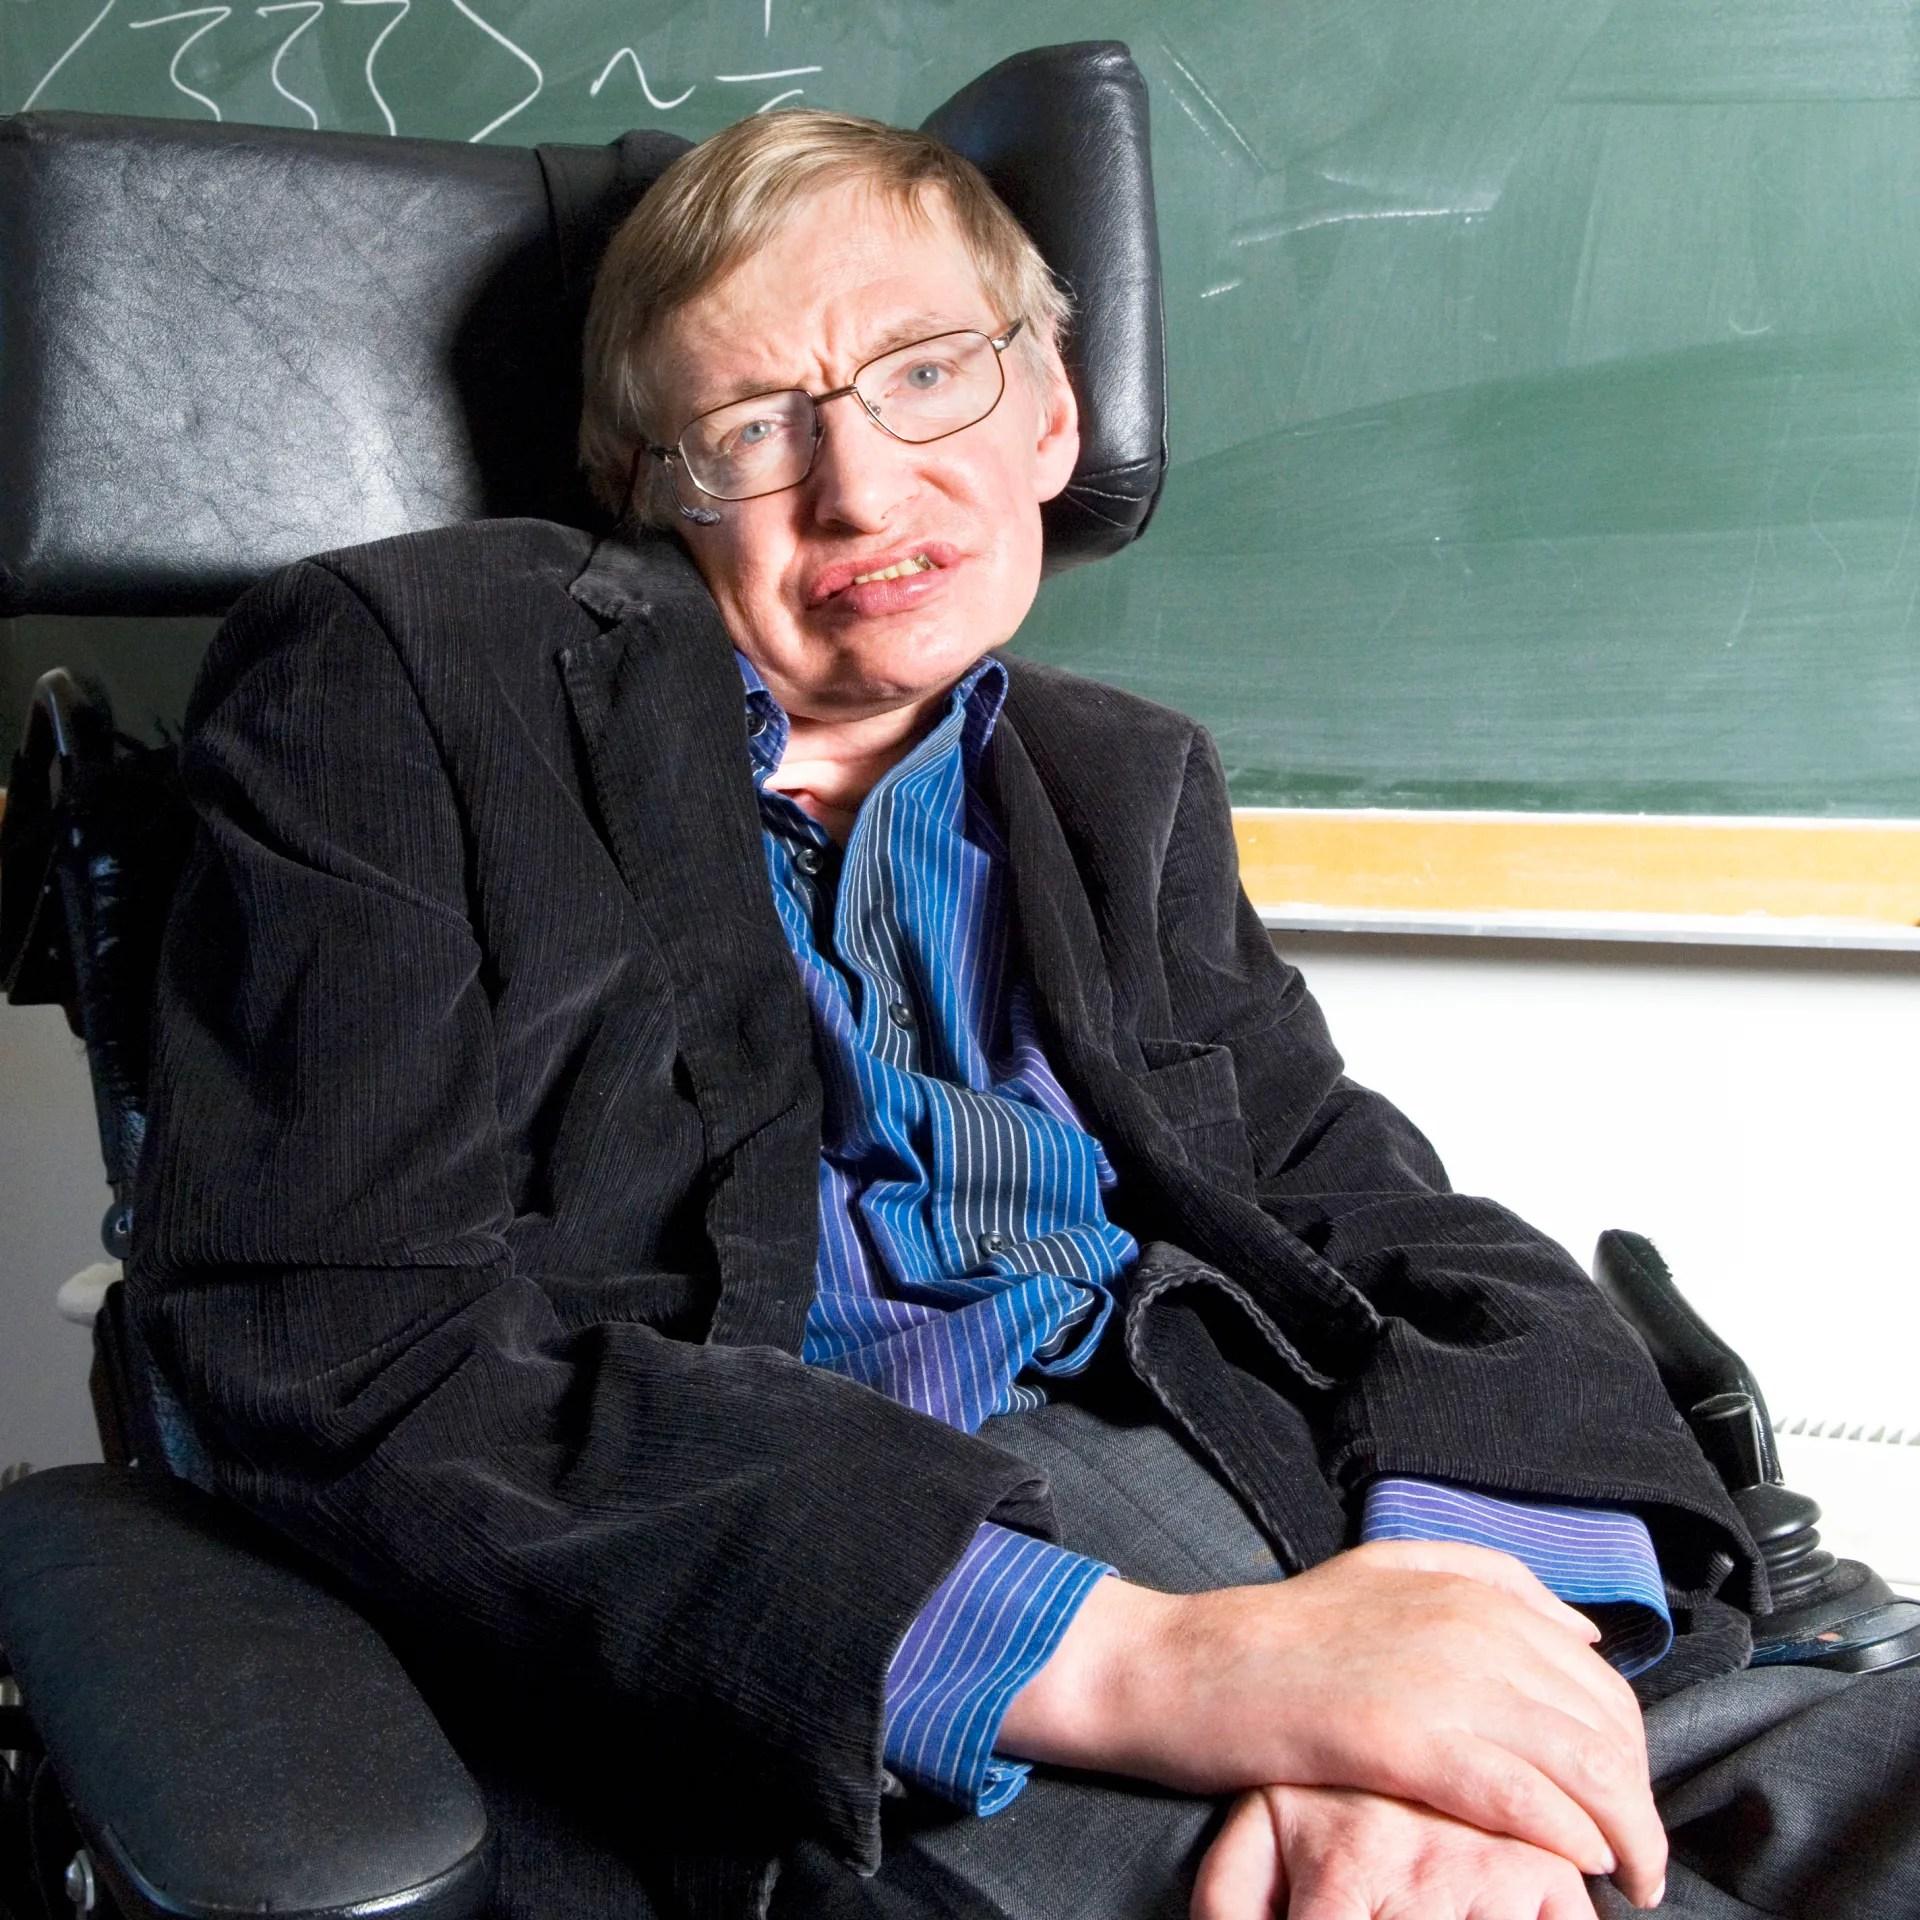 Who Is Stephen Hawking